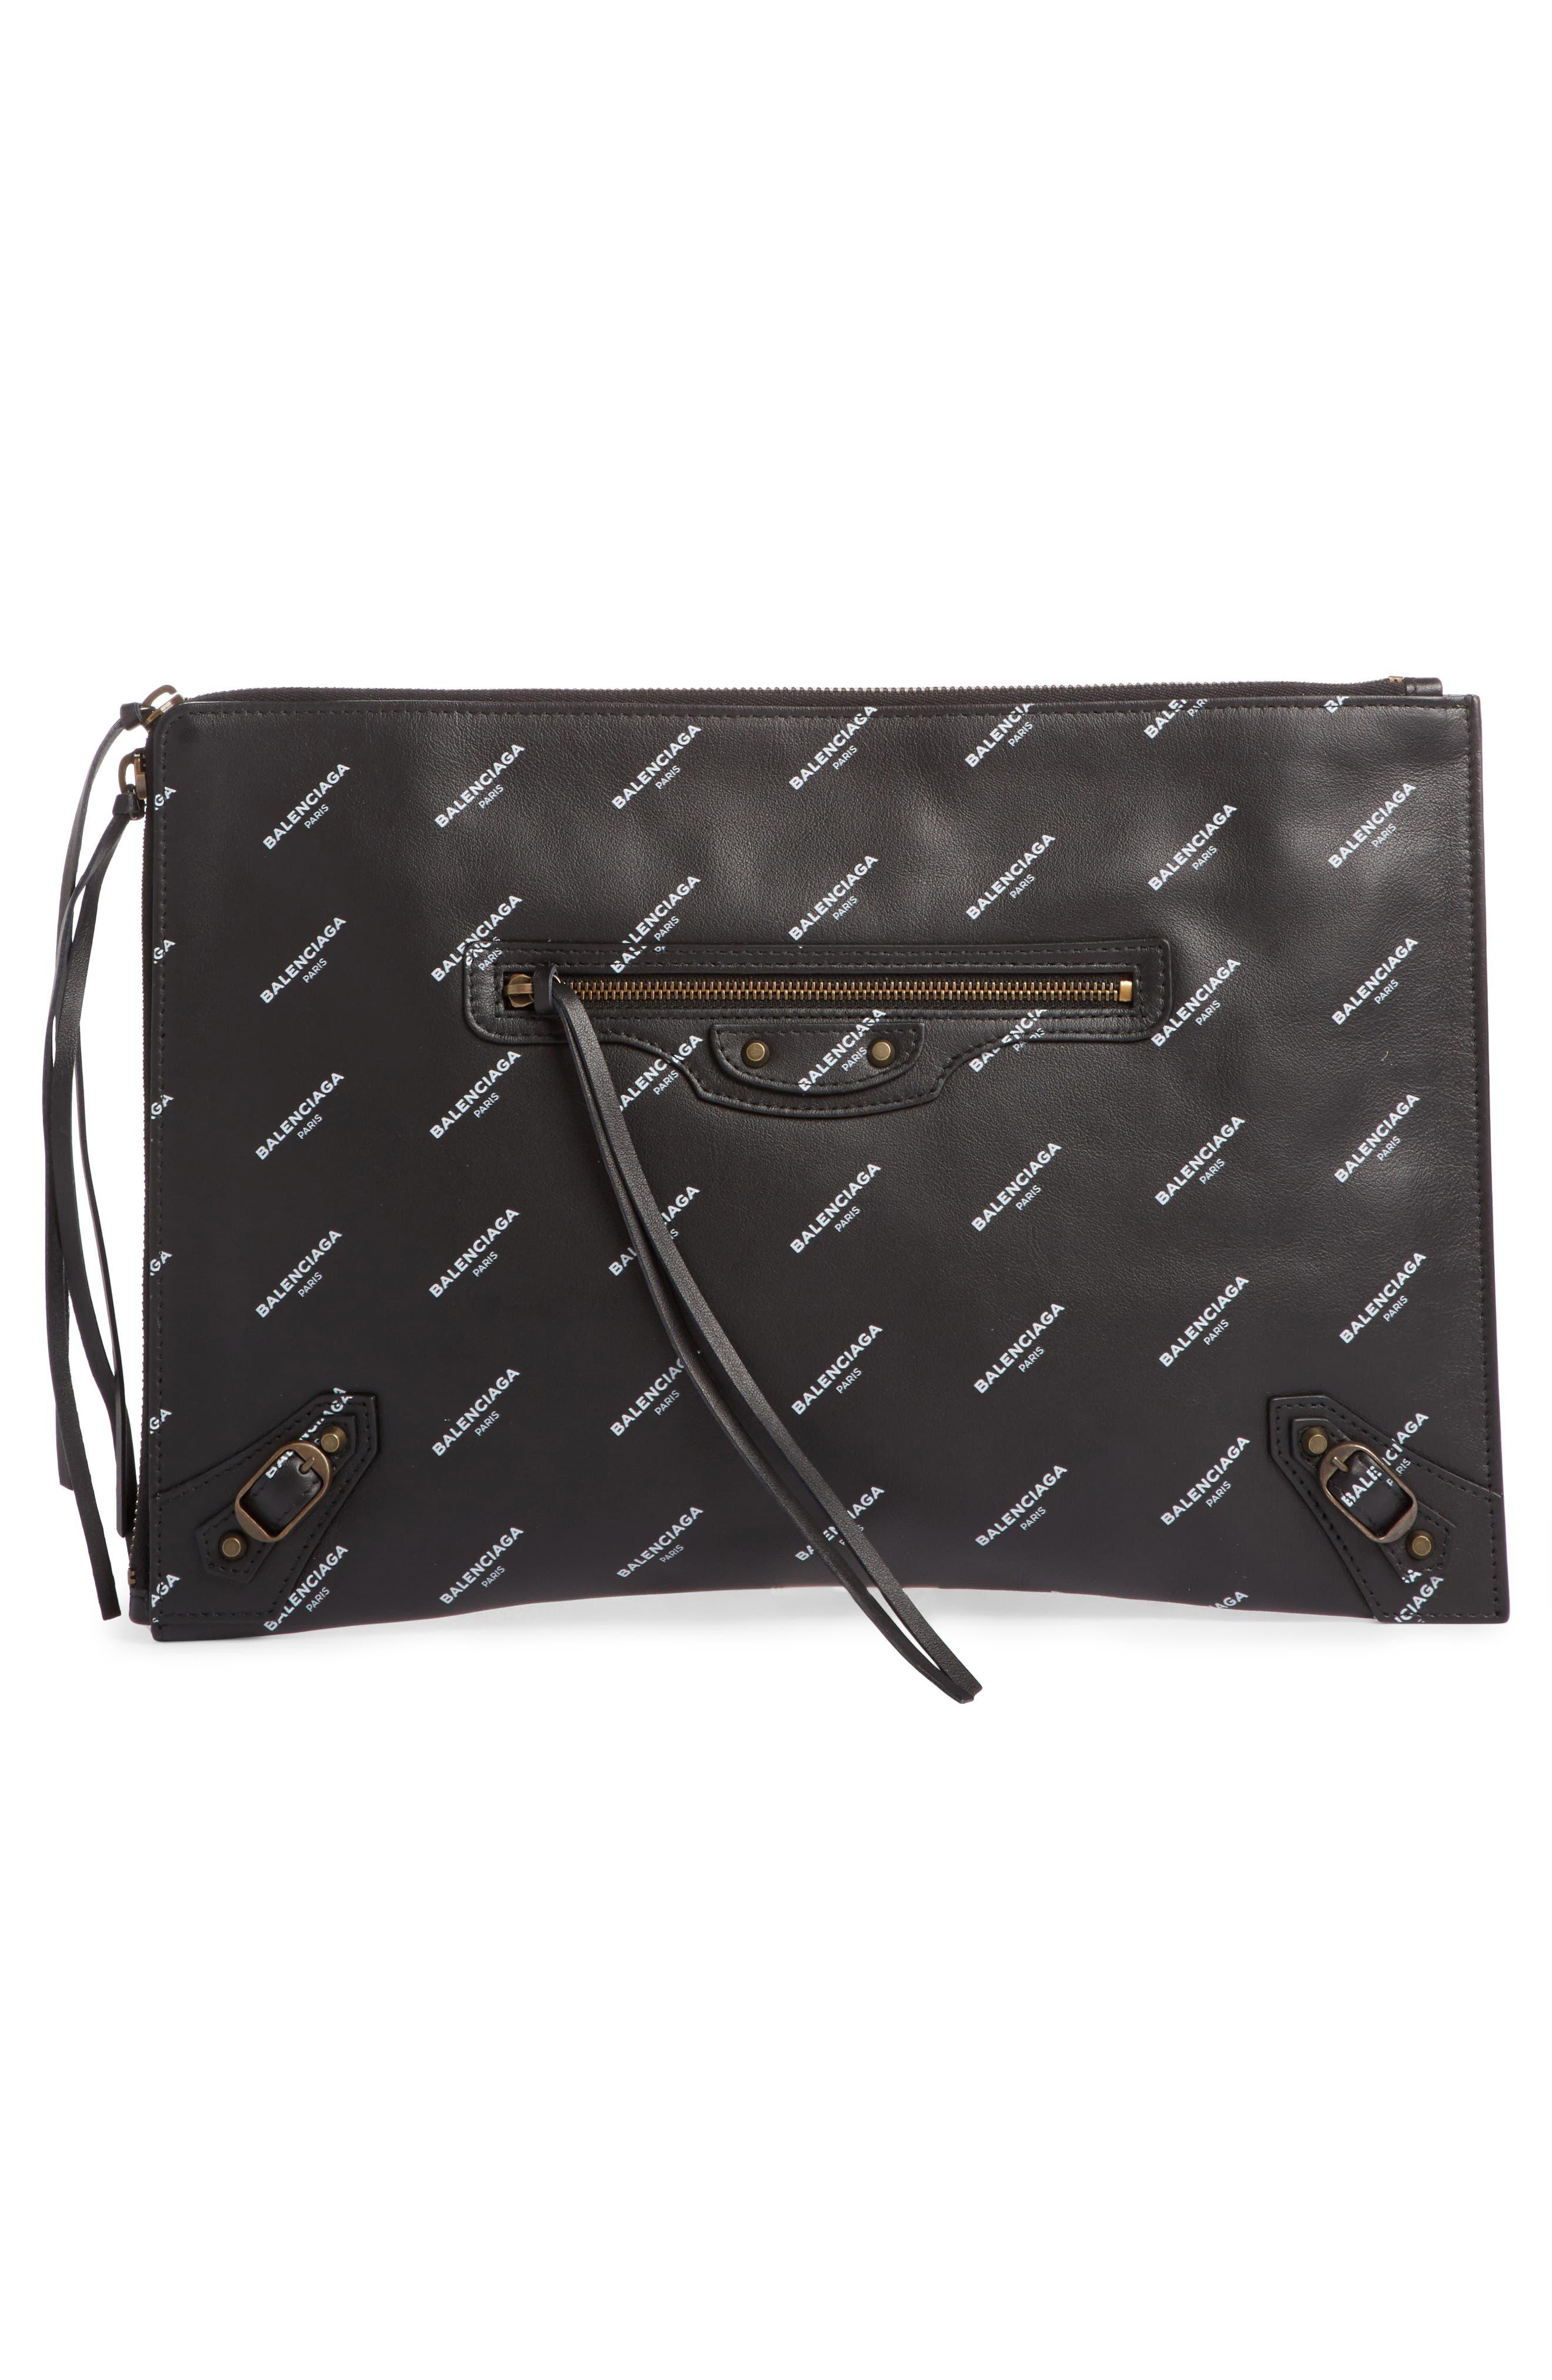 Main Image - Balenciaga Classic Leather Pouch